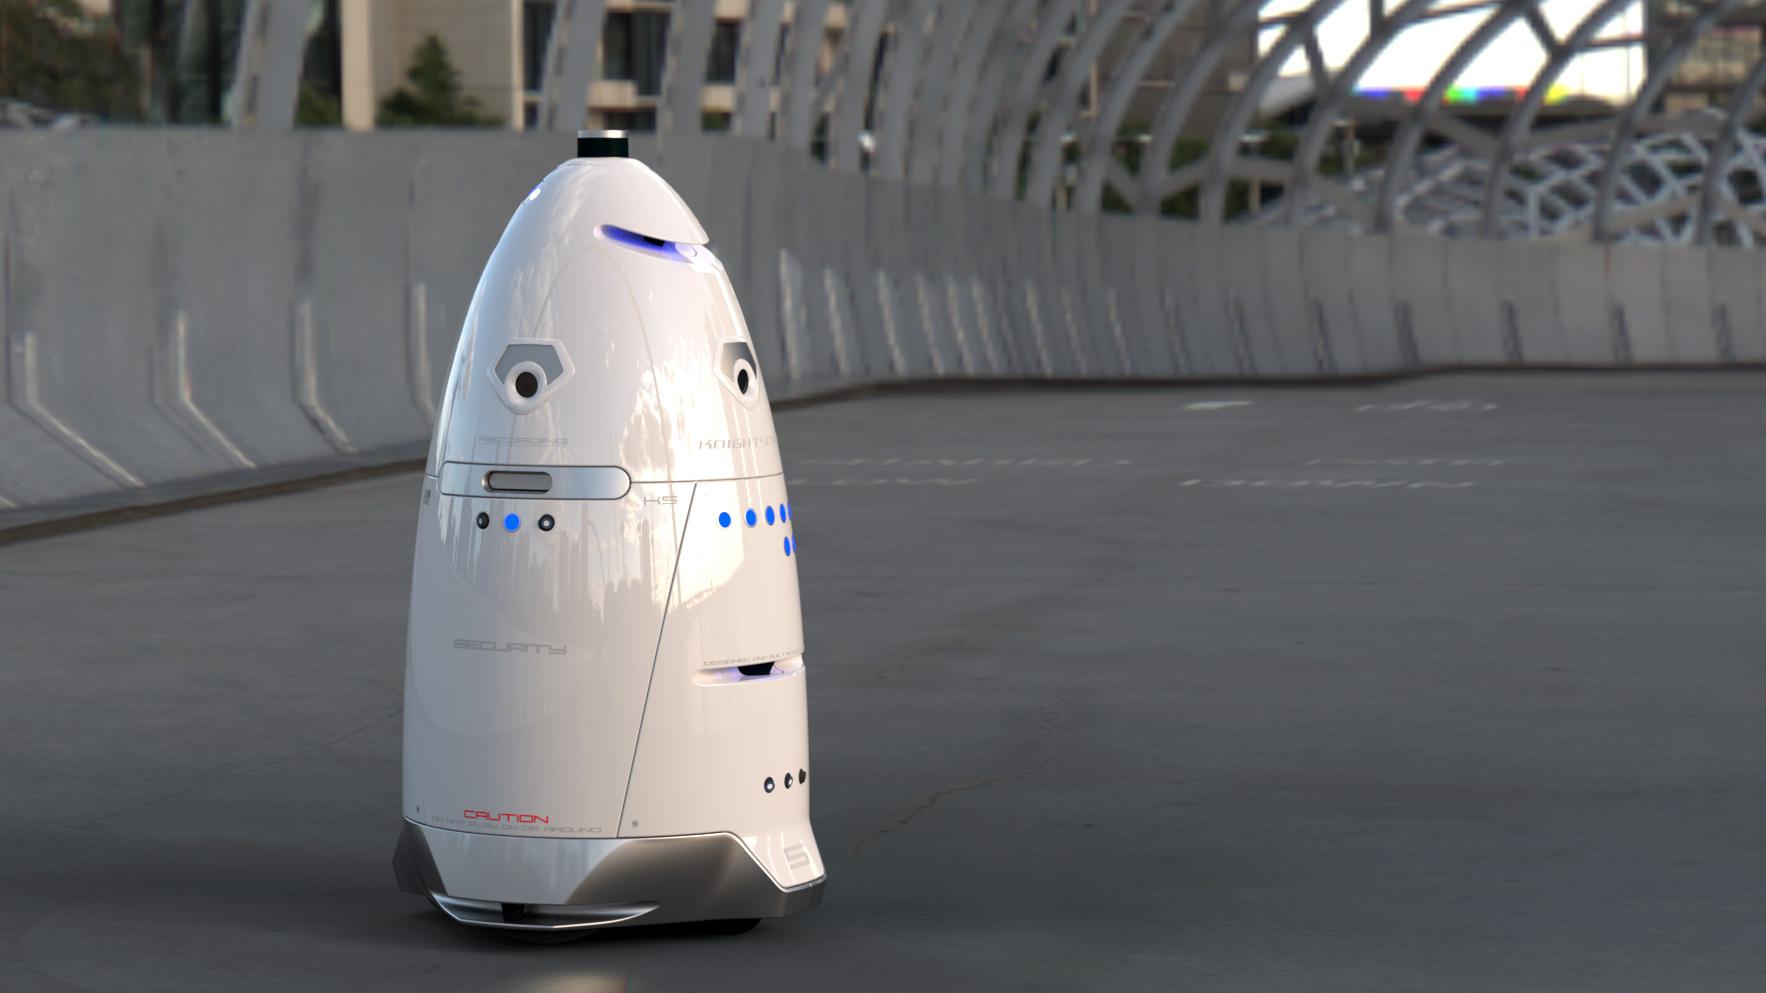 Knightscope's K5 Autonomous Data Machine